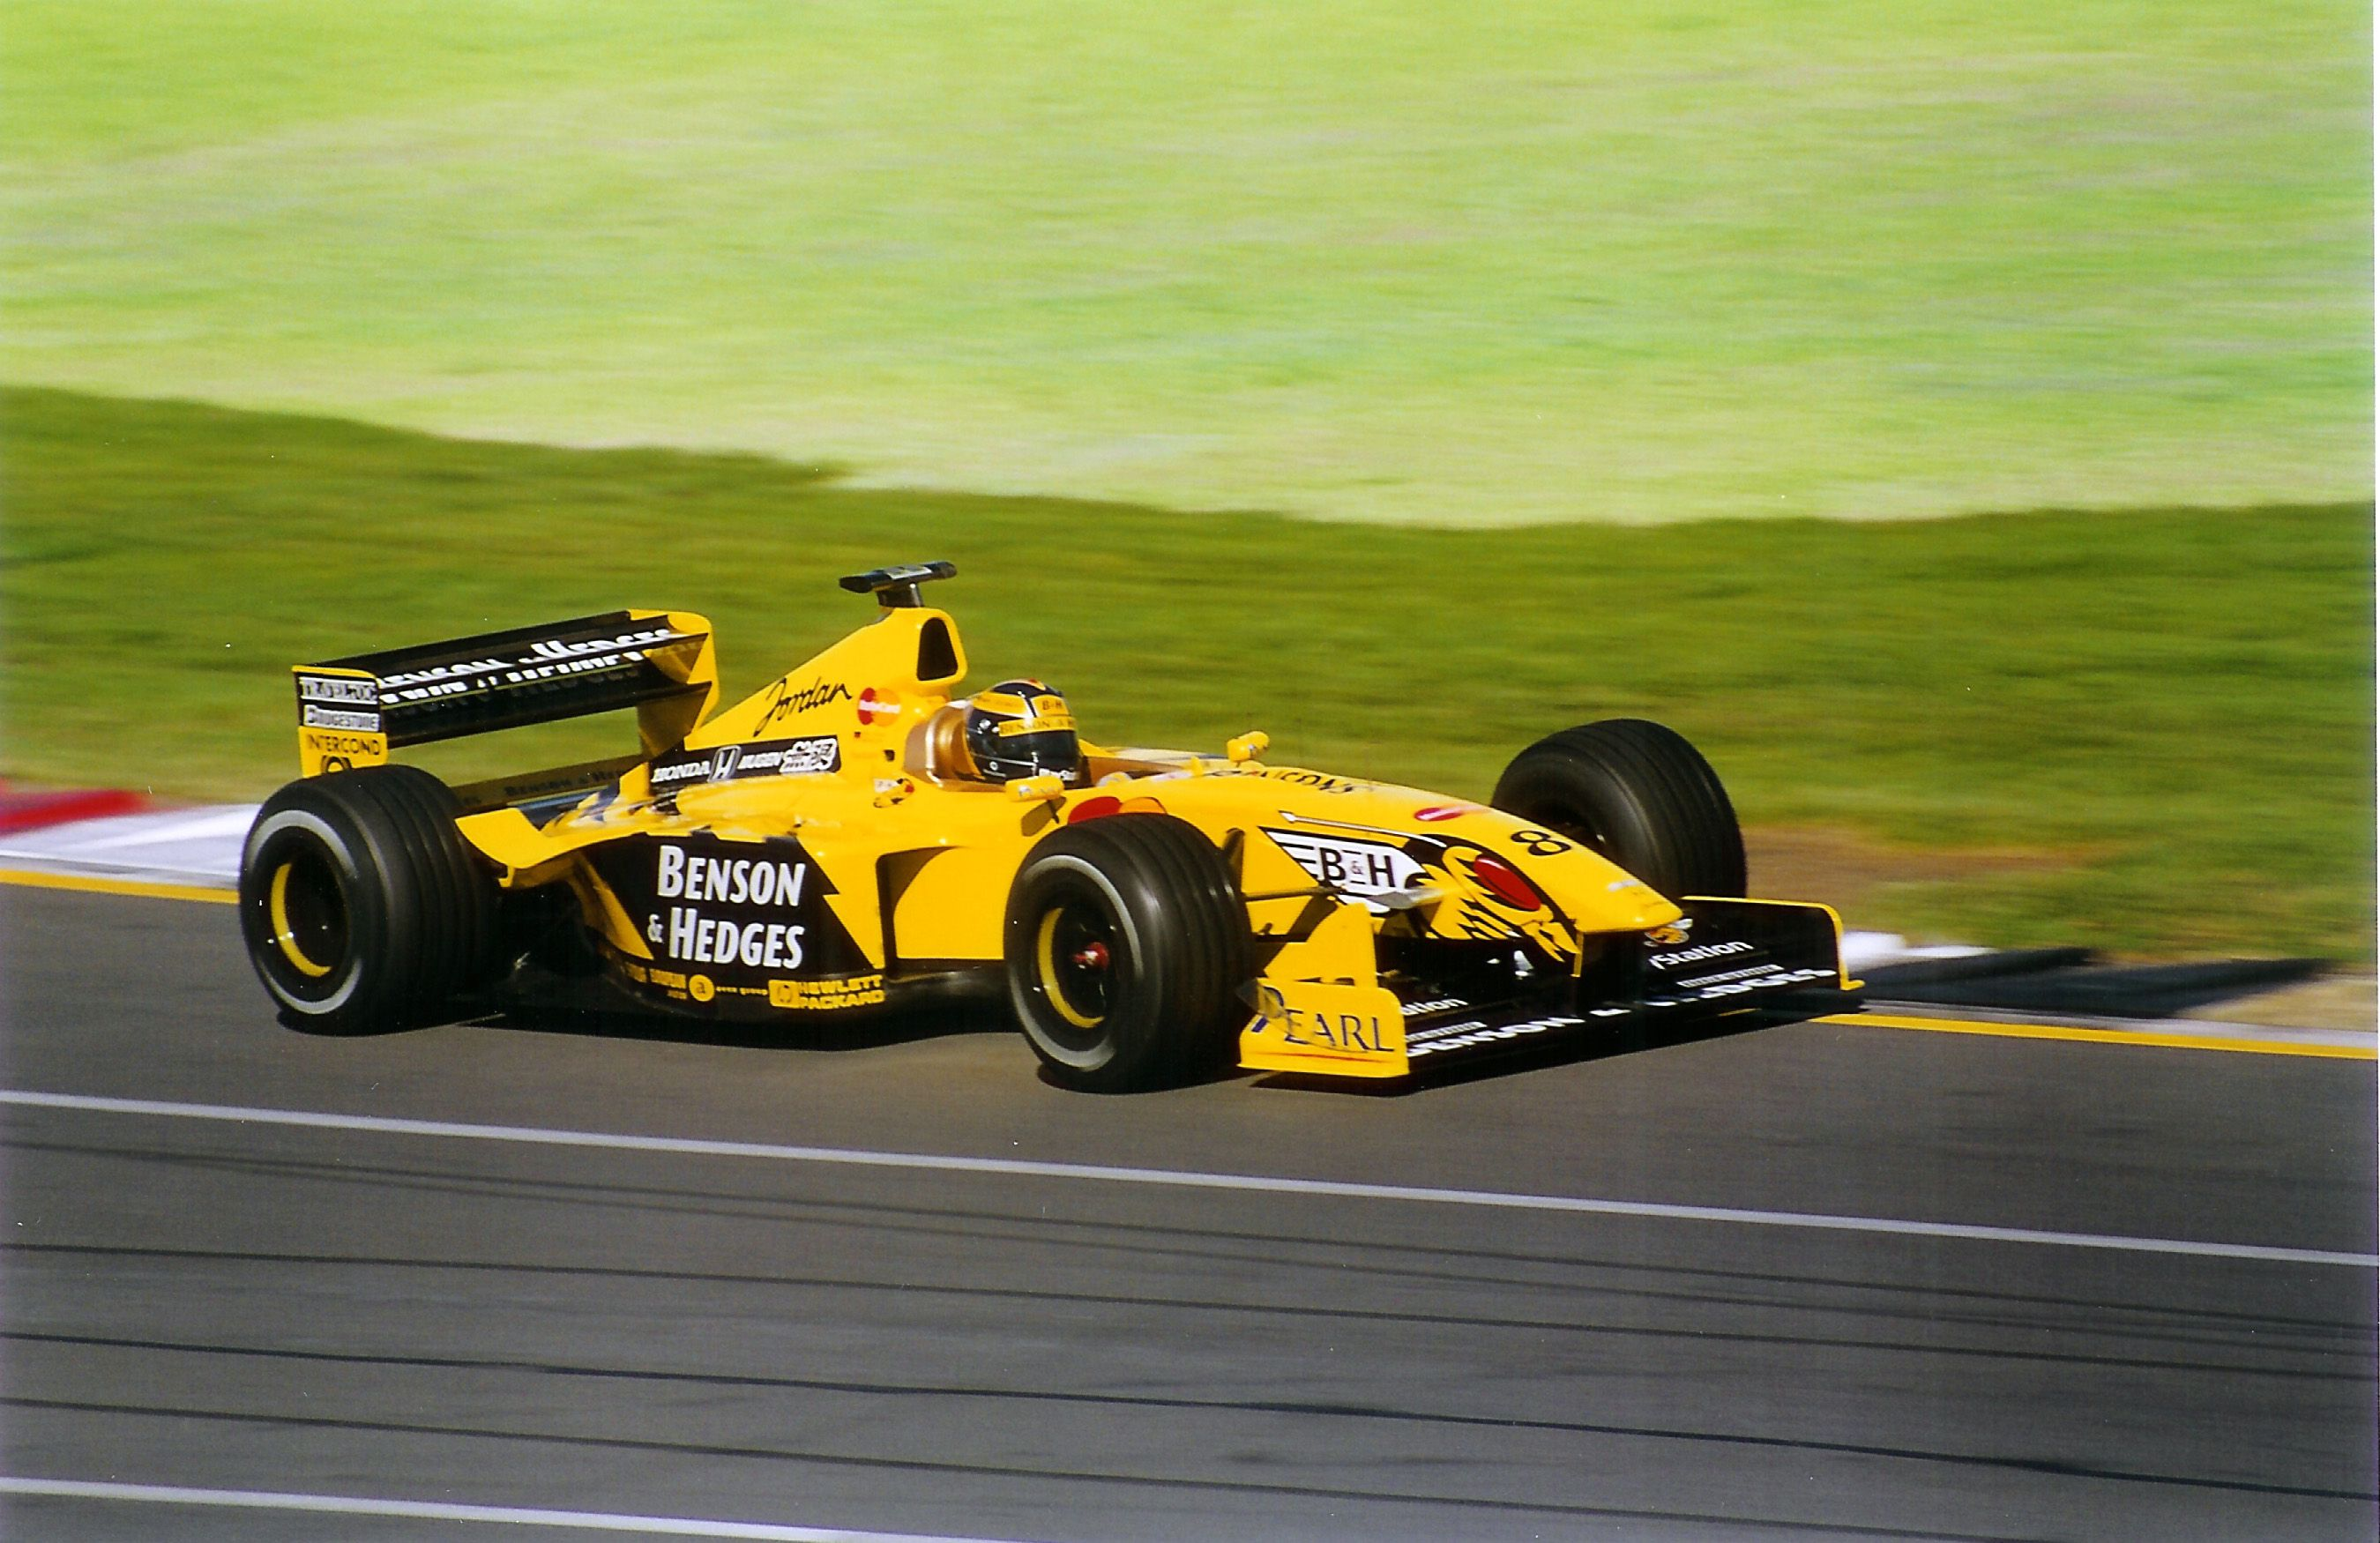 Heinz-Harald Frentzen - 1999 Jordan-Mugen-Honda   Racing, Eddie jordan,  Midland